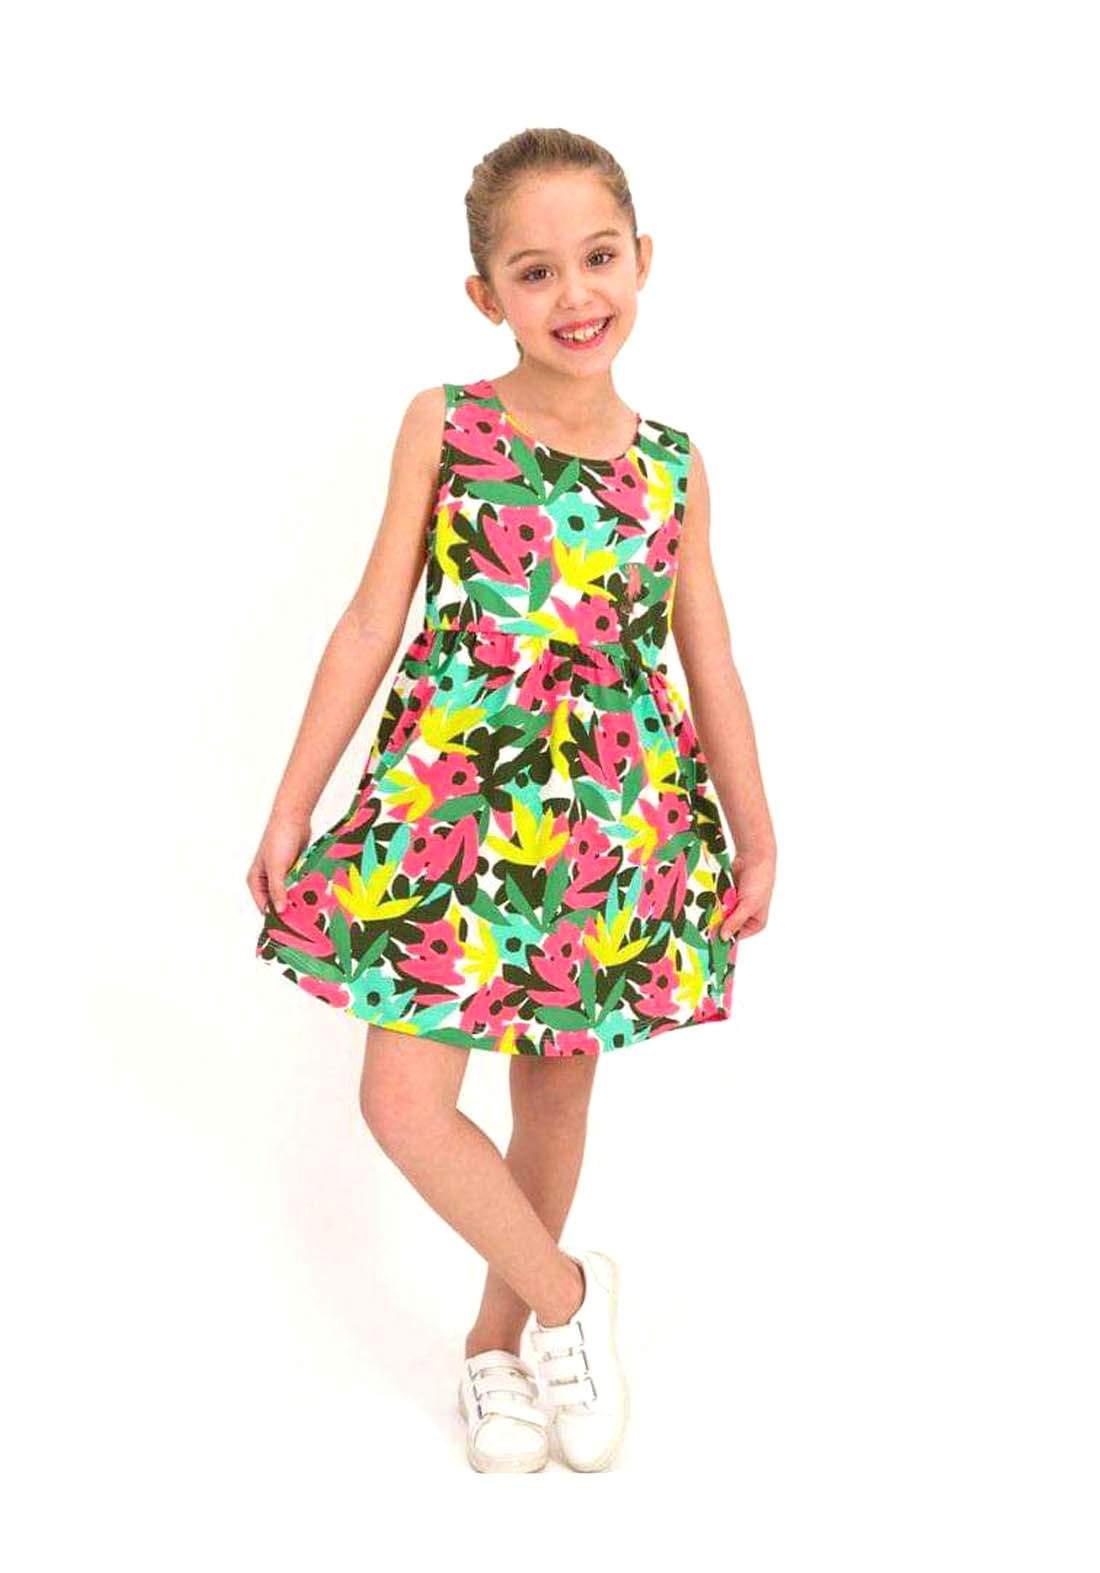 فستان بناتي اخضر ووردي